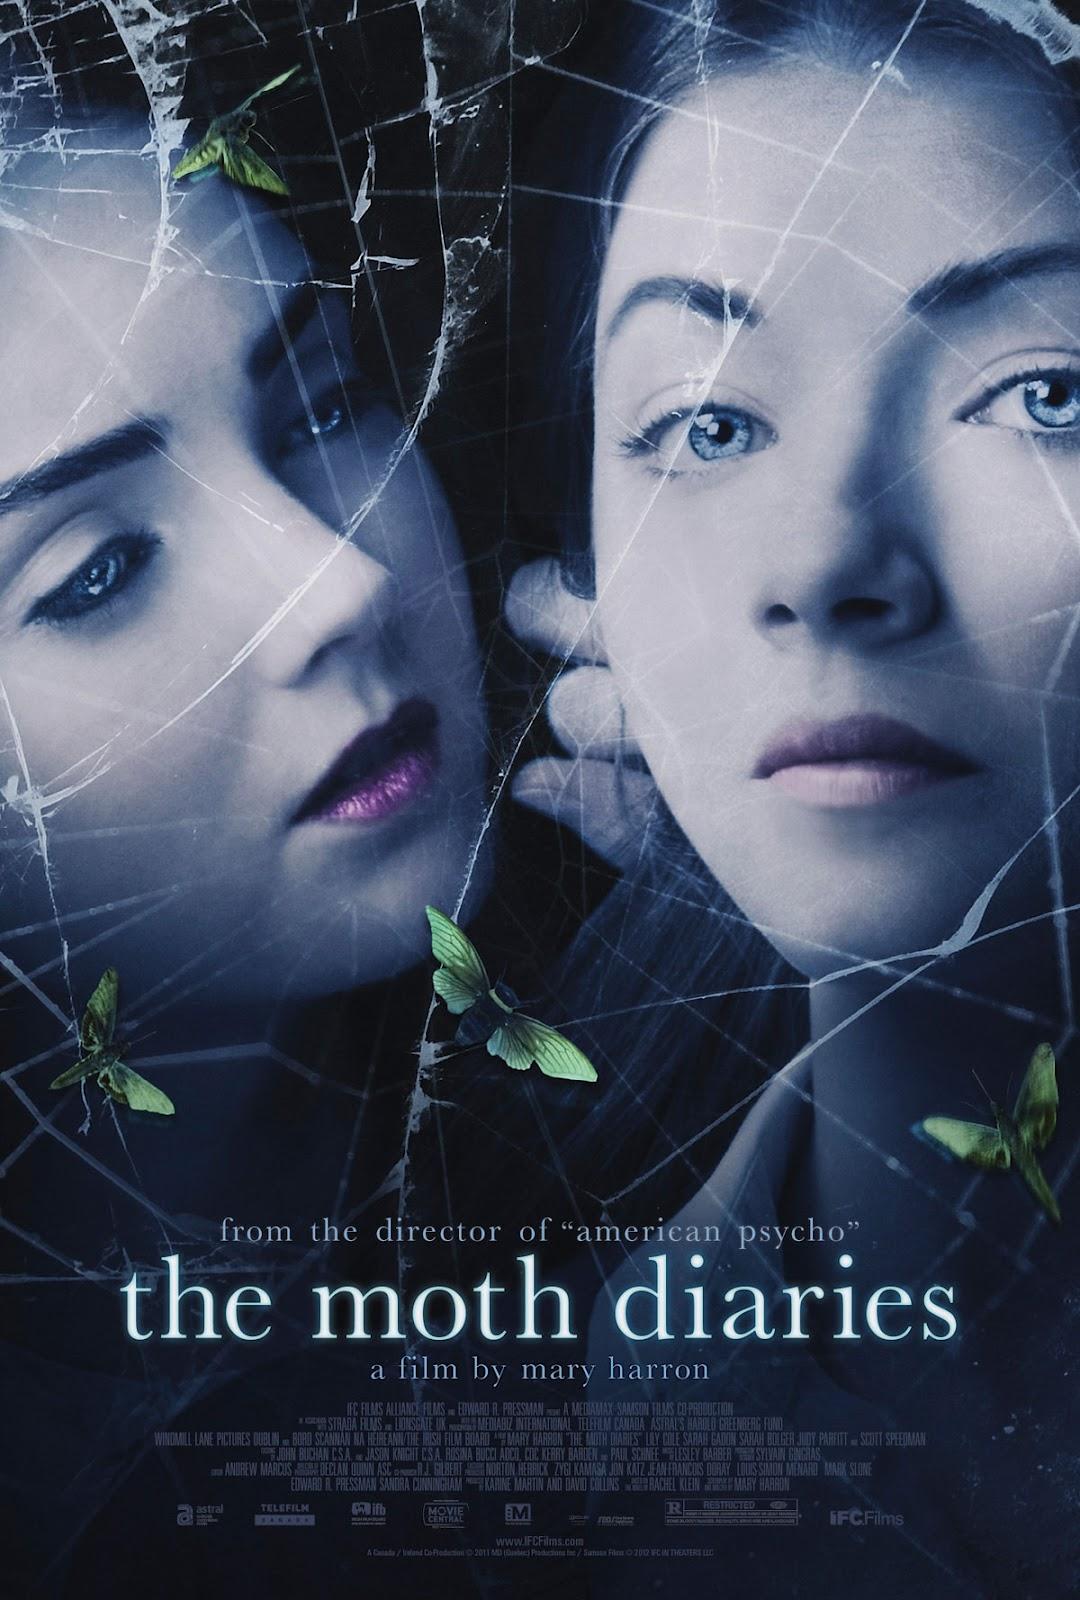 http://3.bp.blogspot.com/-Fi62HEifffU/T0q18UhWAoI/AAAAAAAAChI/ySAS4yR-w6M/s1600/the-moth-diaries-poster.jpg